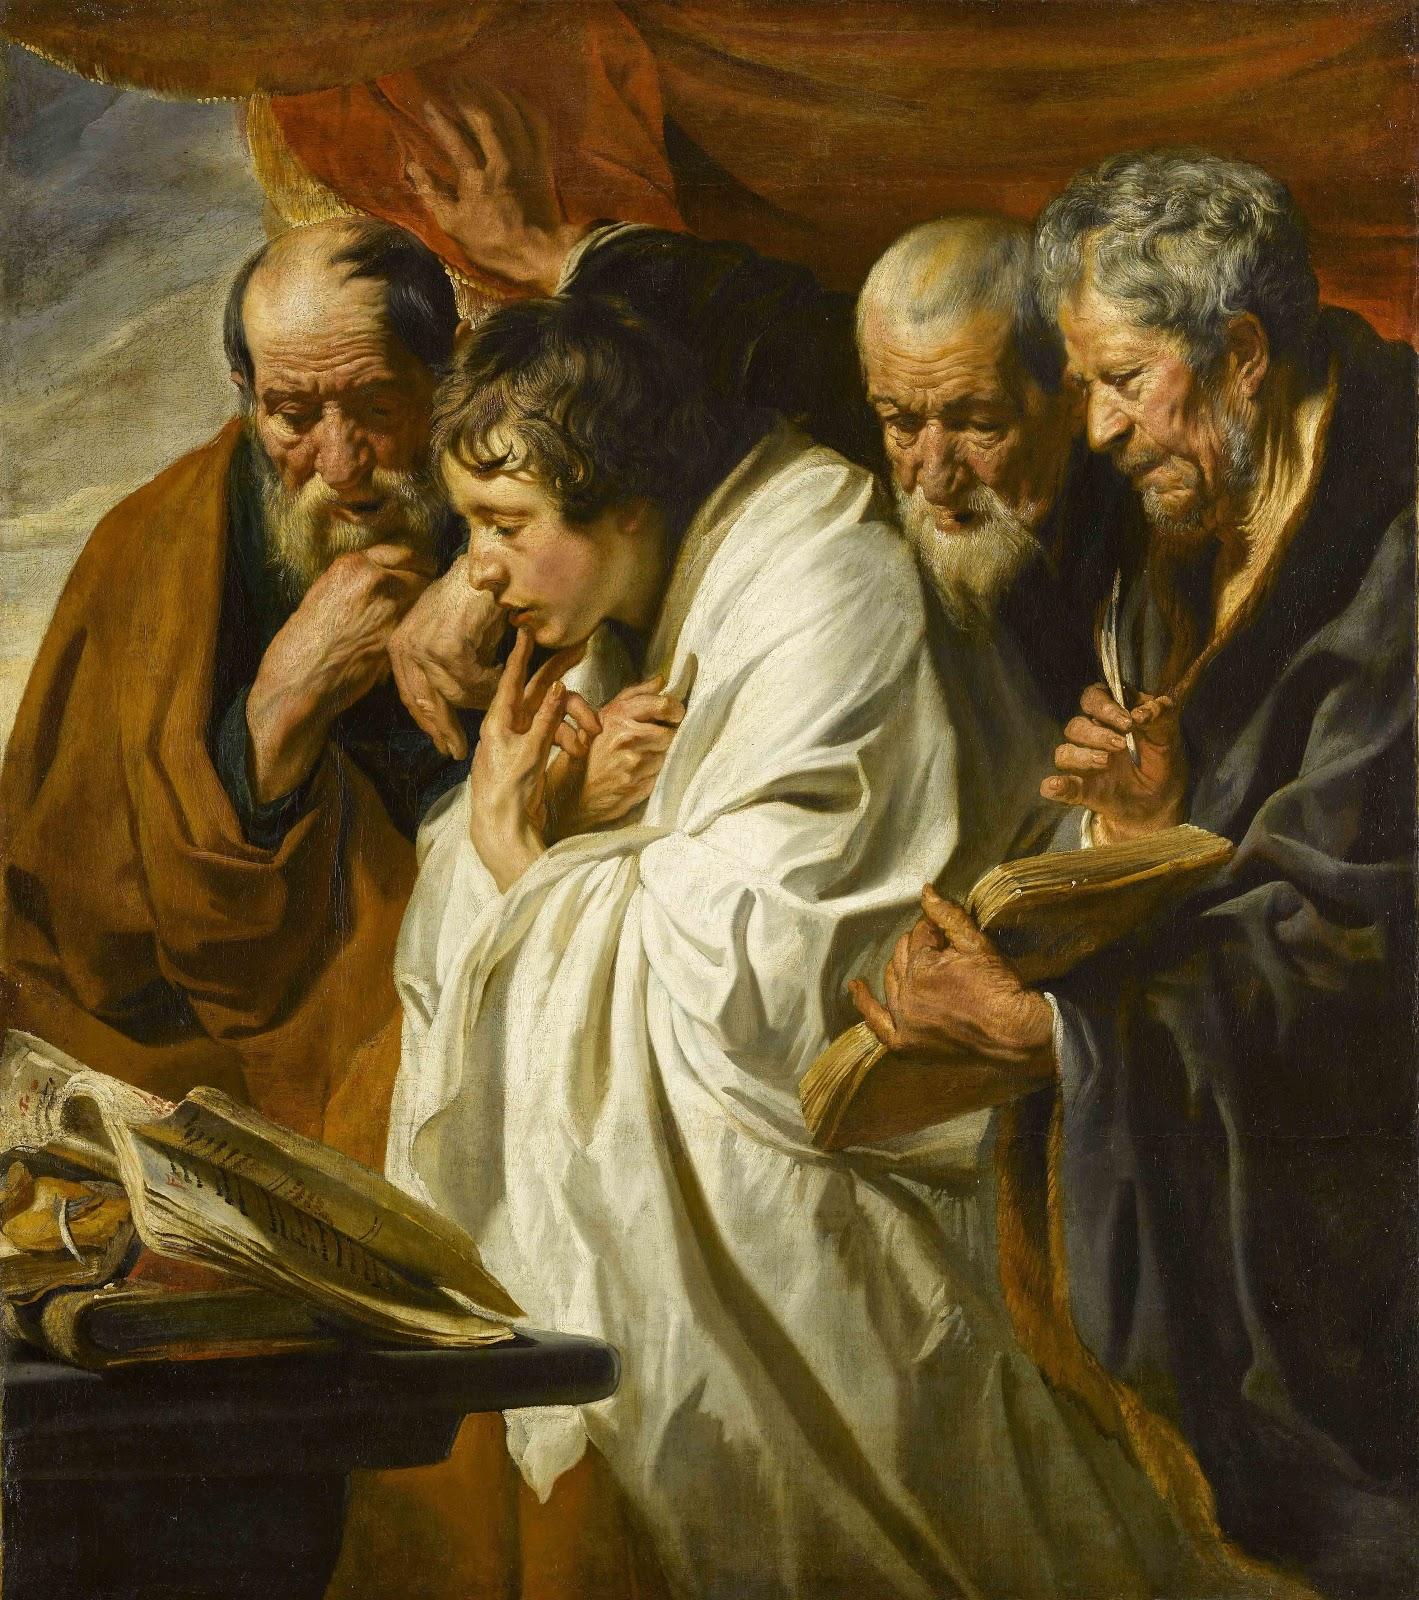 Jacob jordaens baroque era painter tutt 39 art for Famous artist in baroque period